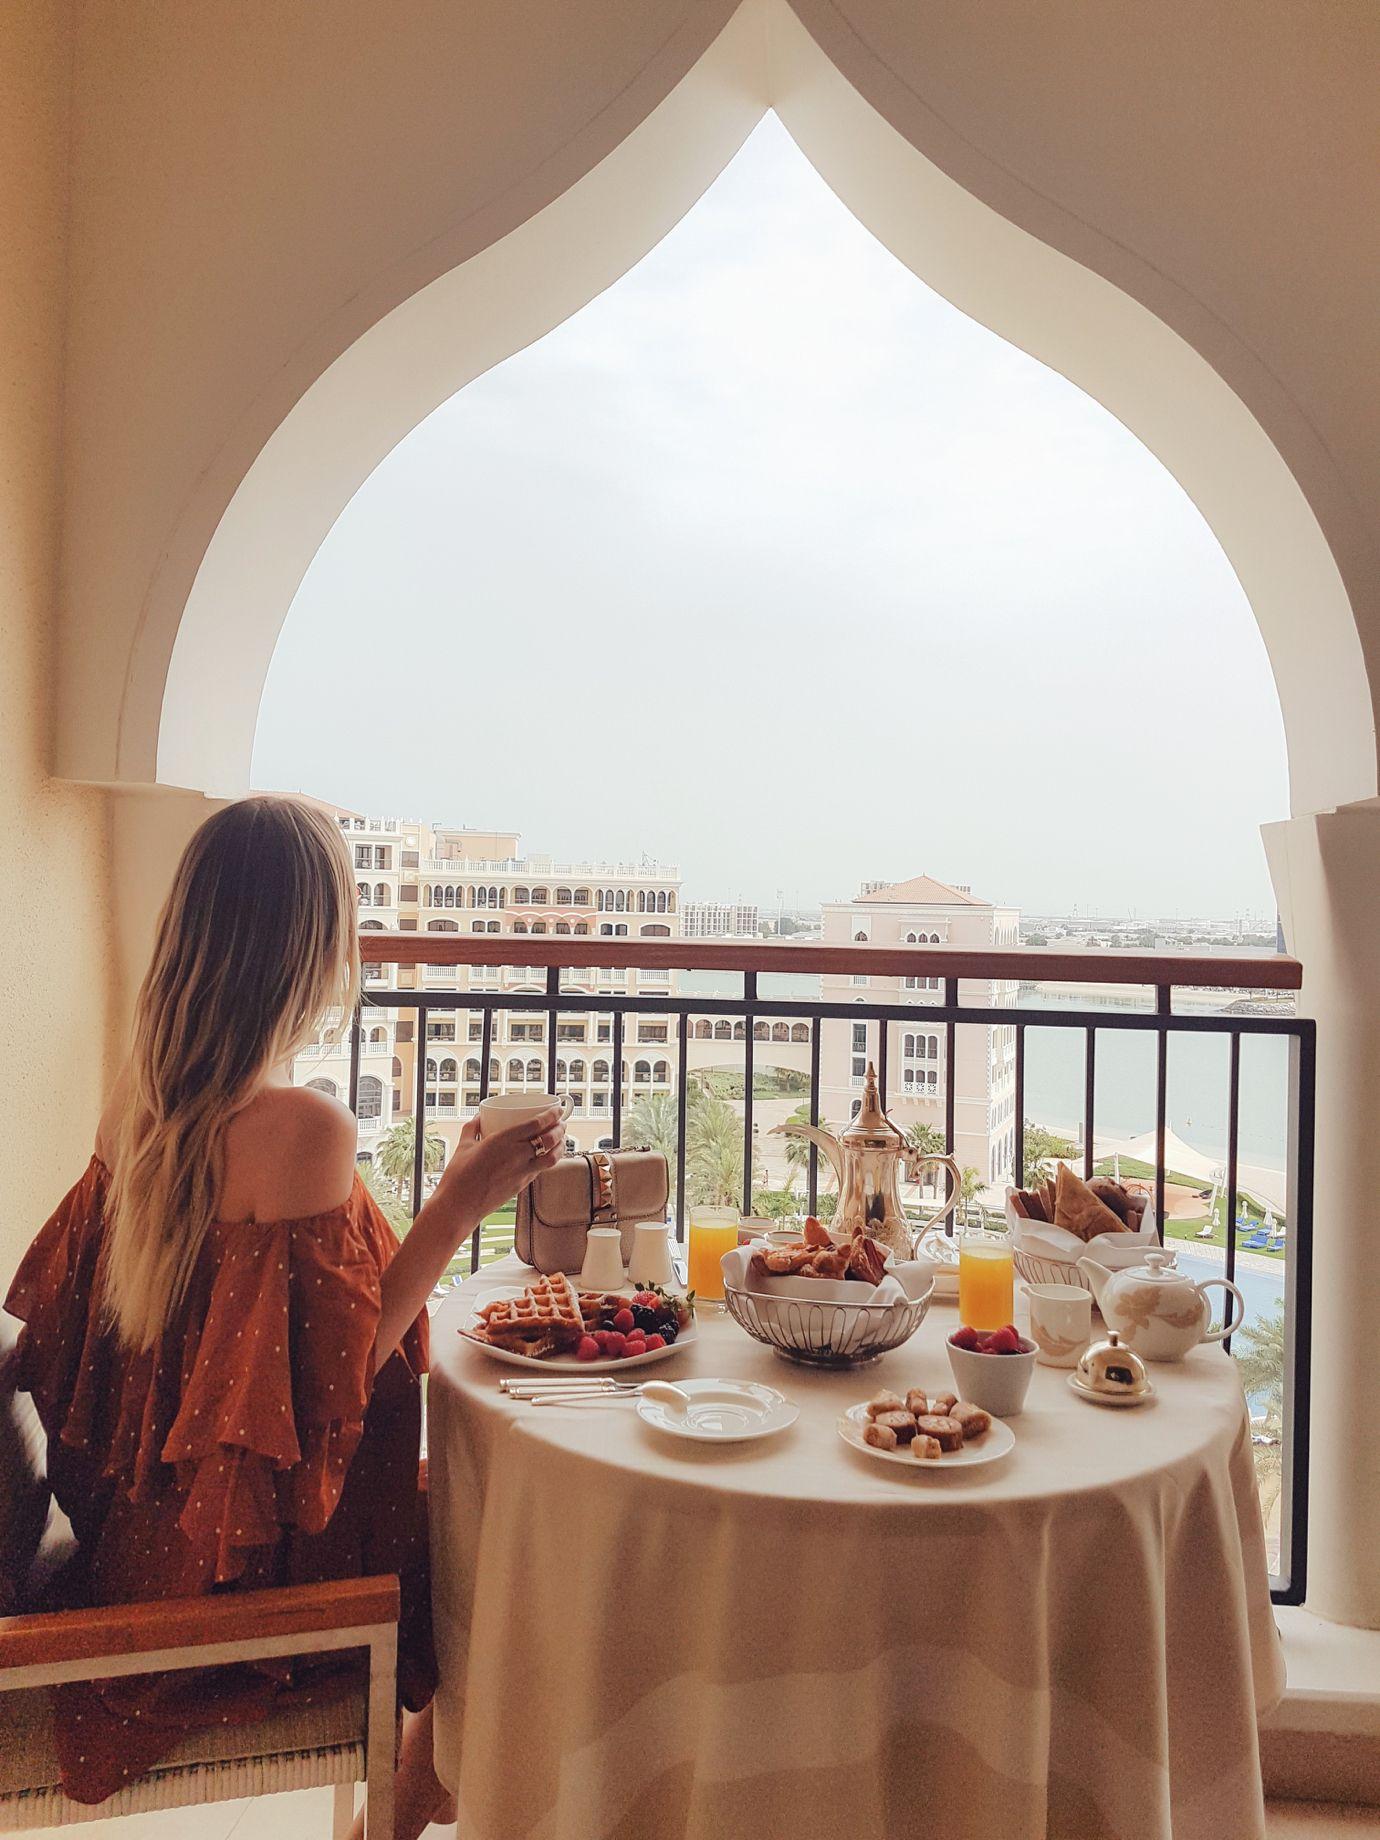 Breakfast at the Ritz-Carlton I Abu Dhabi http://www.ohhcouture.com/2017/04/abu-dhabi-2017/ #leoniehanne #ohhcouture